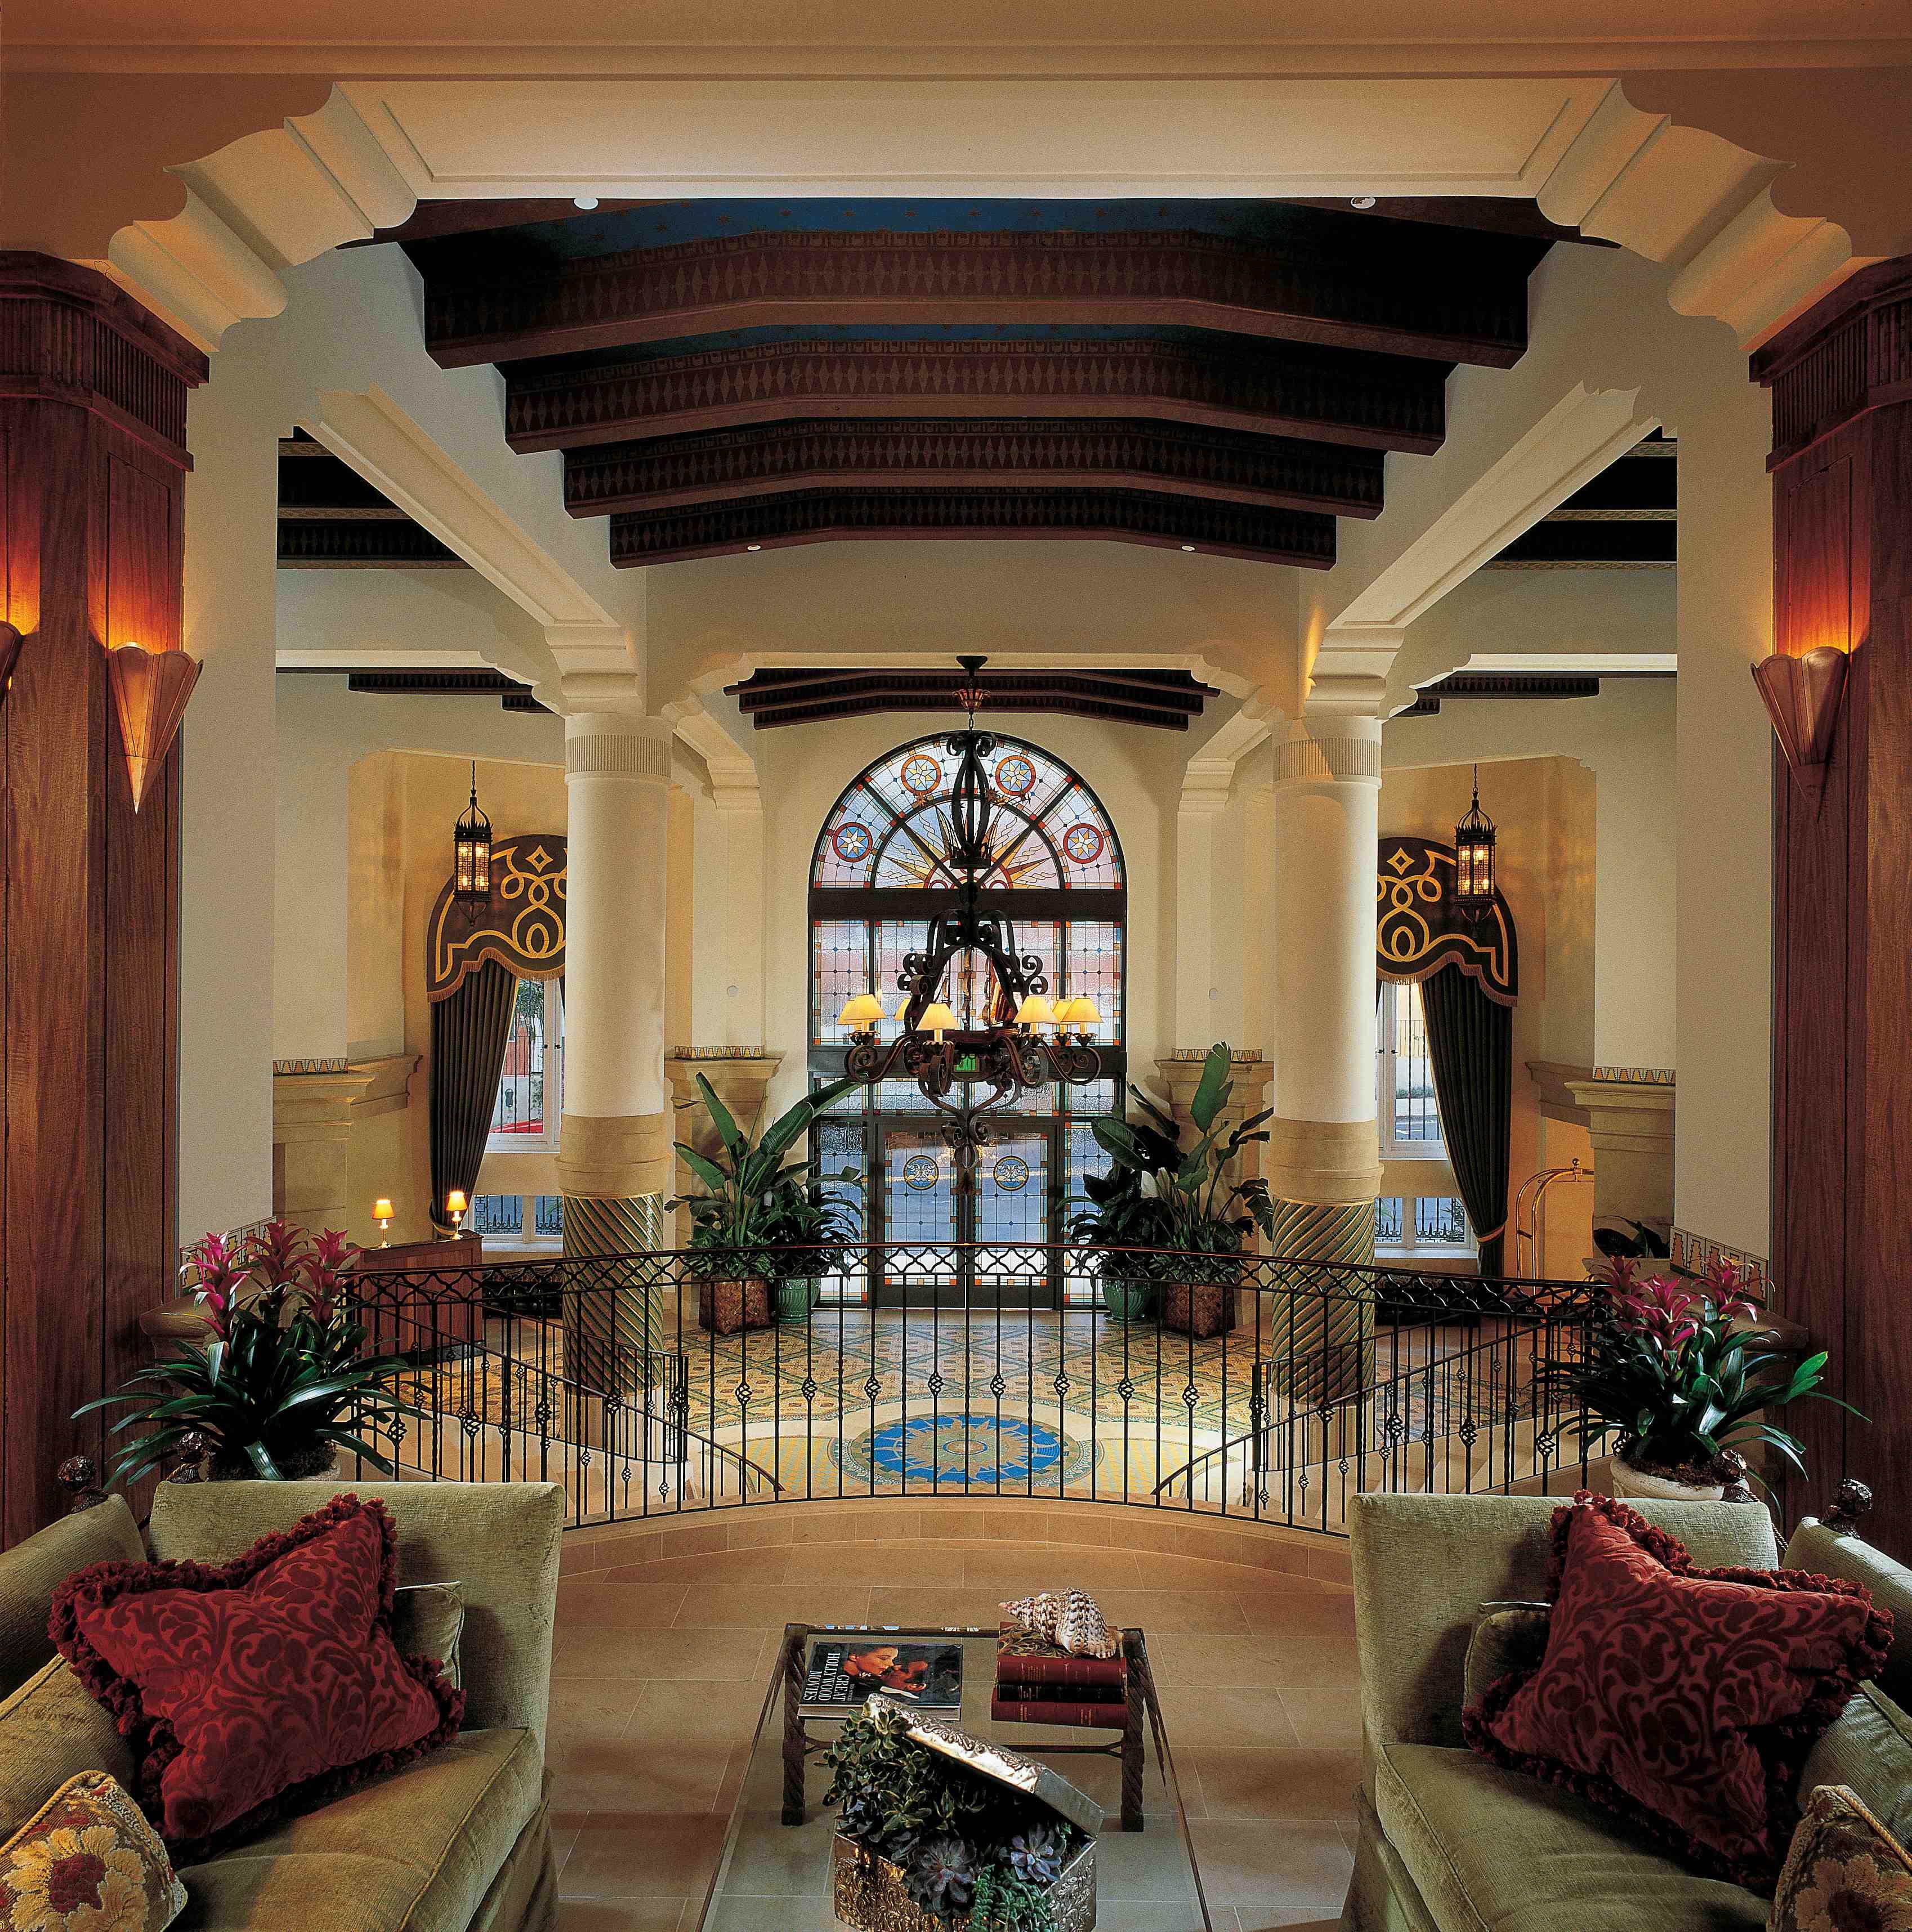 Impressive Casa Del Mar lobby